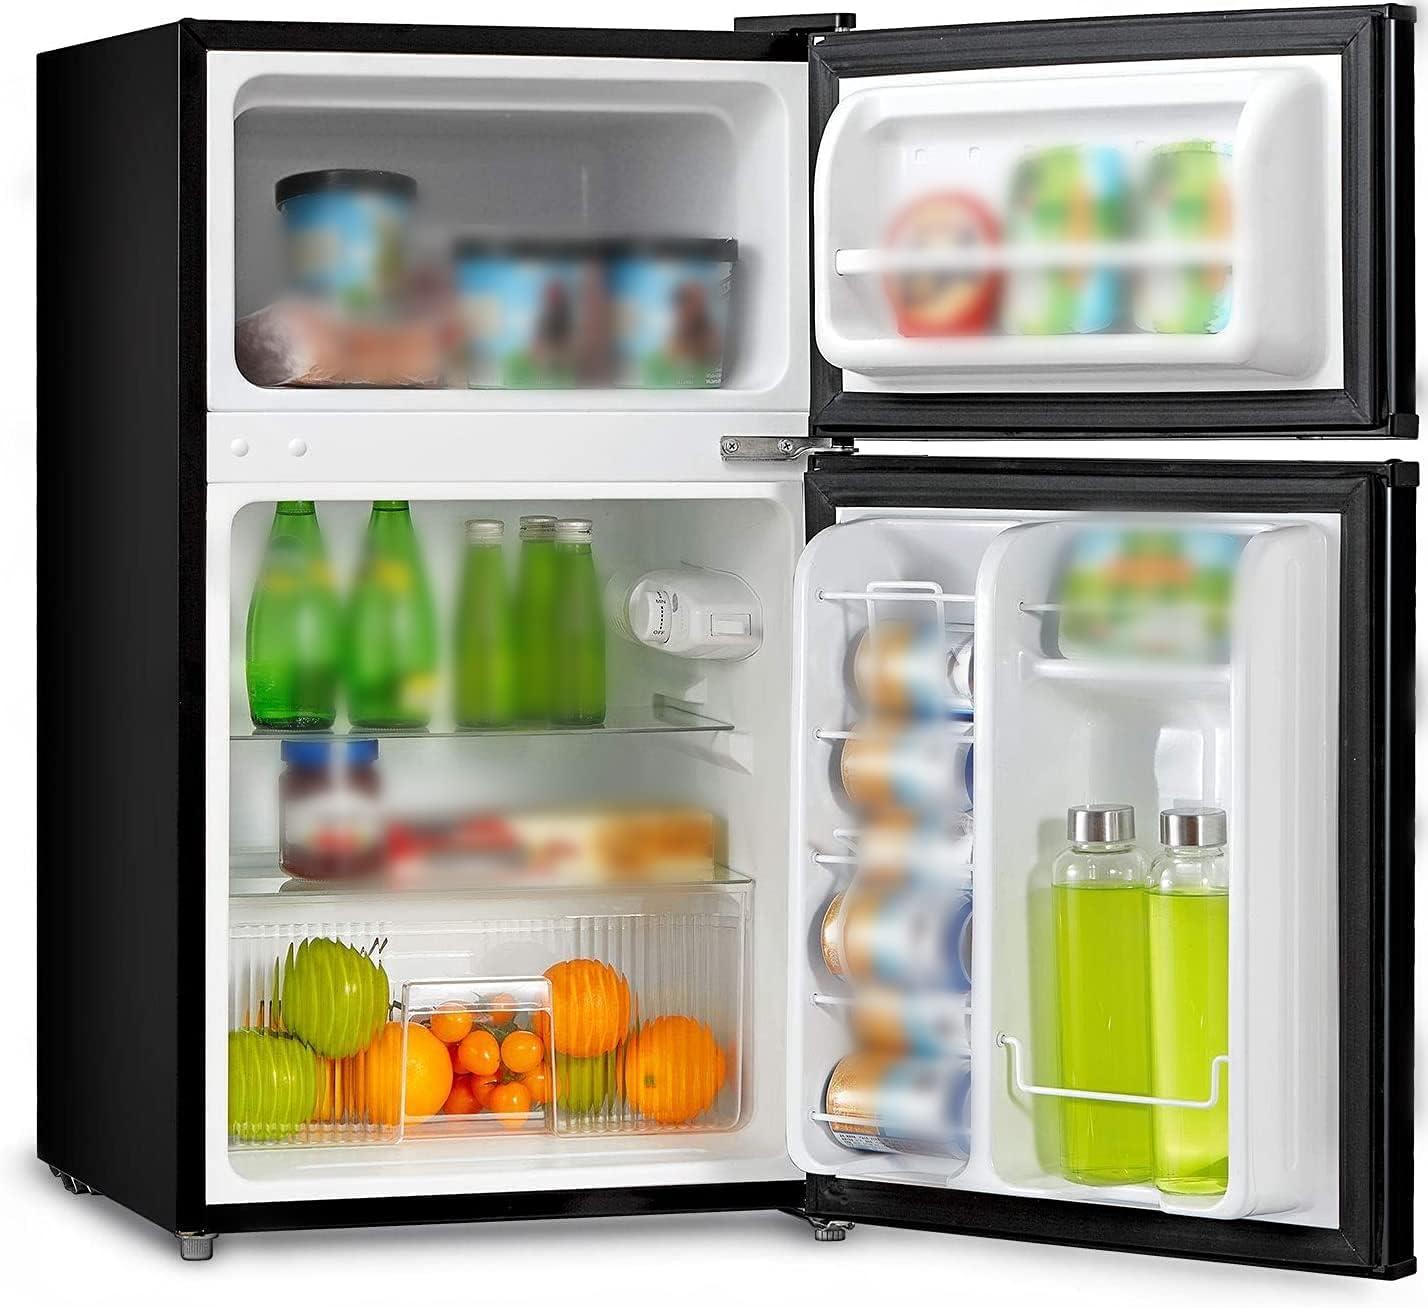 Refrigerators Appliances Double-Door Mini Fridge 3.1 Cu Ft,113-FW1 ...